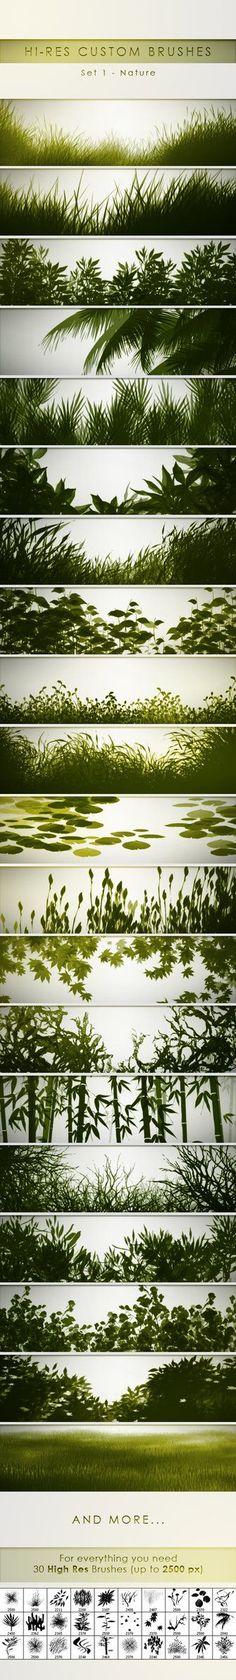 30 Hi-Res Custom Brushes - Nature by PrismaDesign.deviantart.com on @DeviantArt